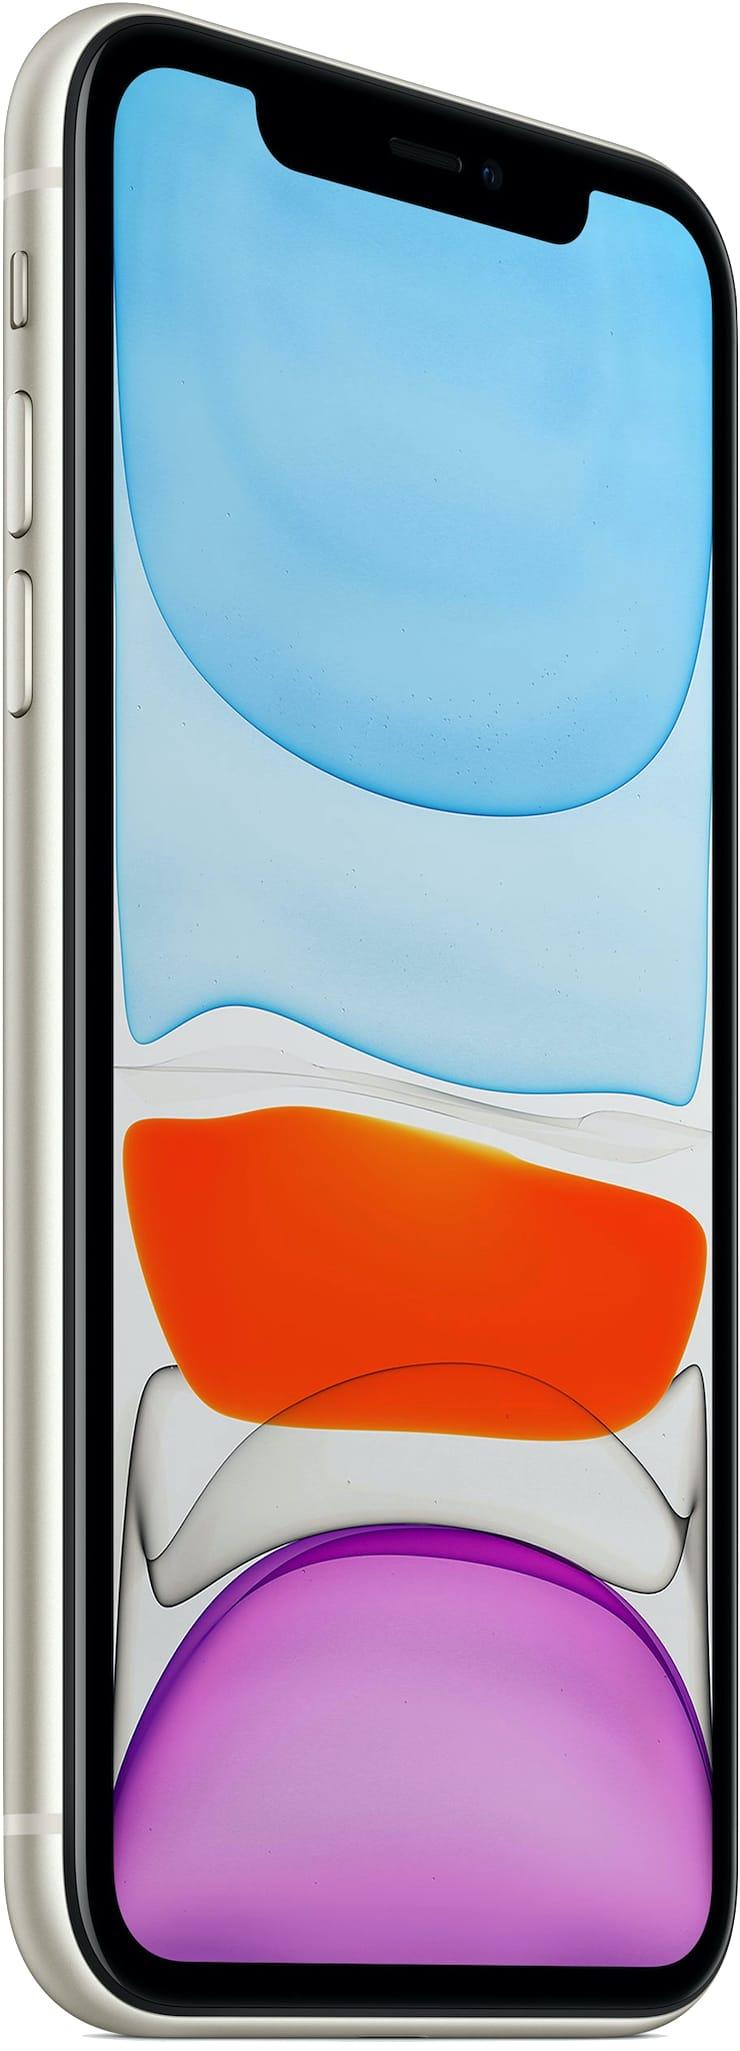 Дисплей Retina и True Tone в iPhone — в чем разница?